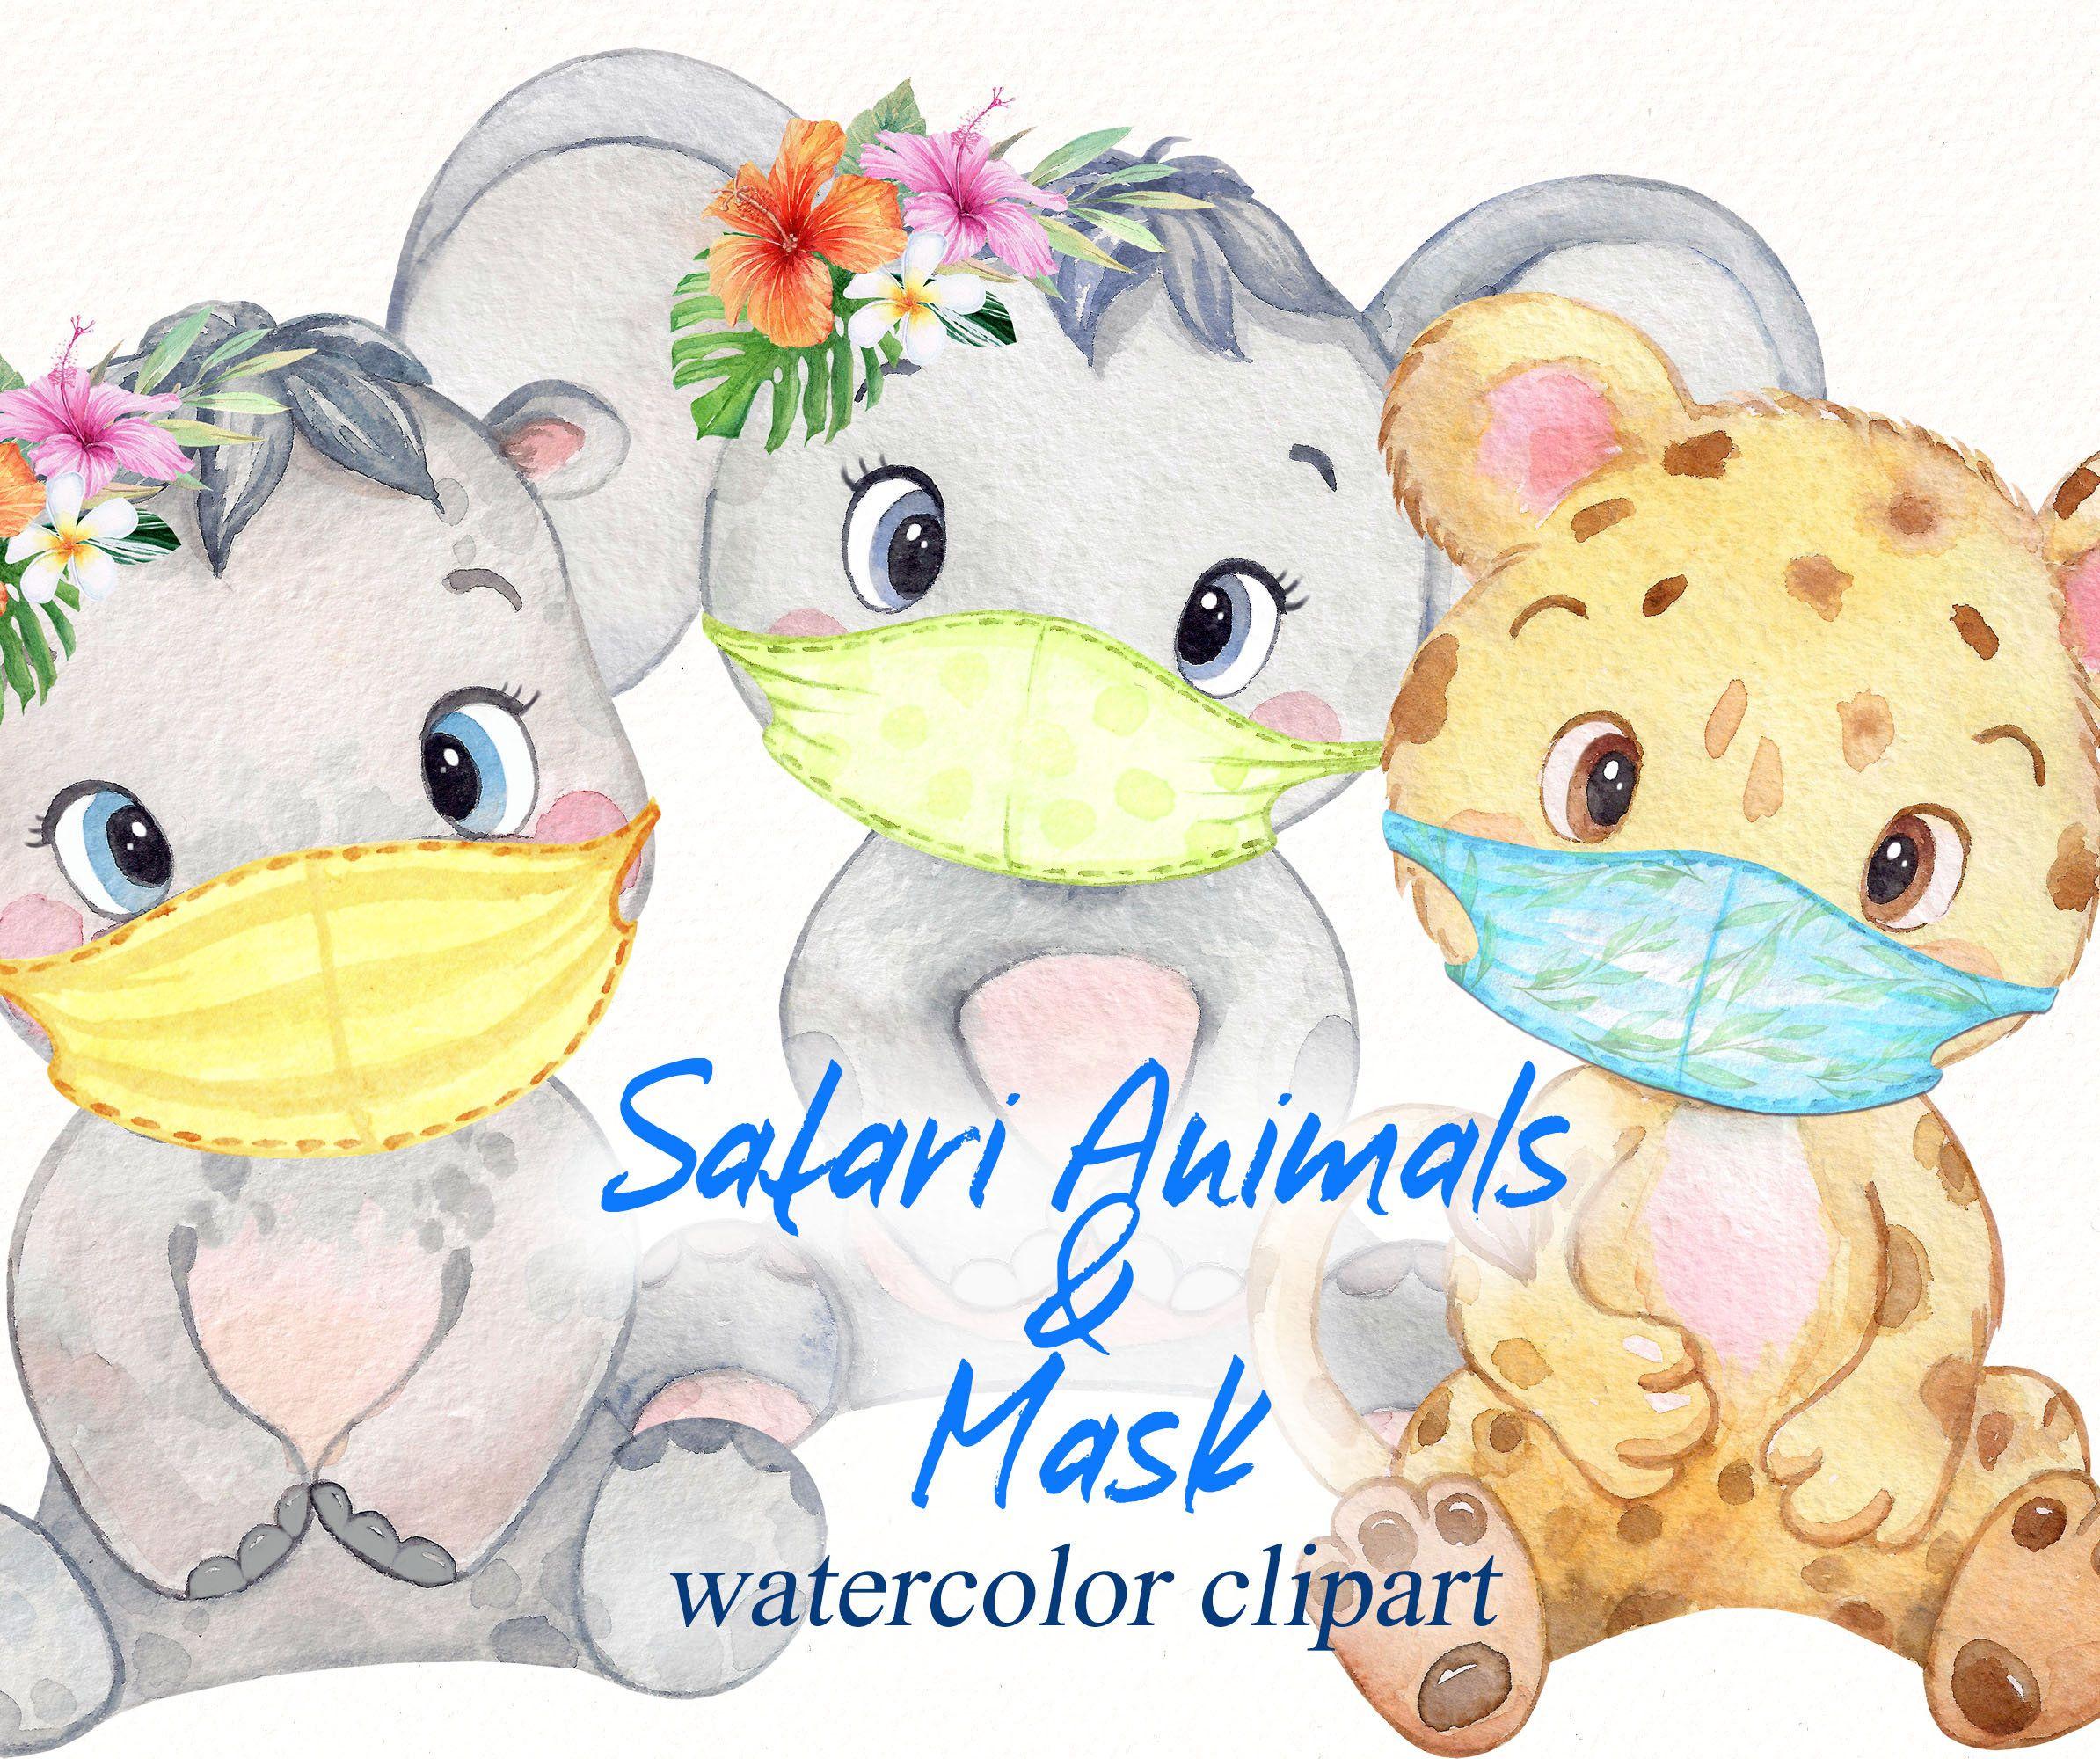 Safari Animals And Medicine Masks Clipart Watercolor Baby Etsy In 2021 Safari Animals Clipart Safari Animals Clip Art